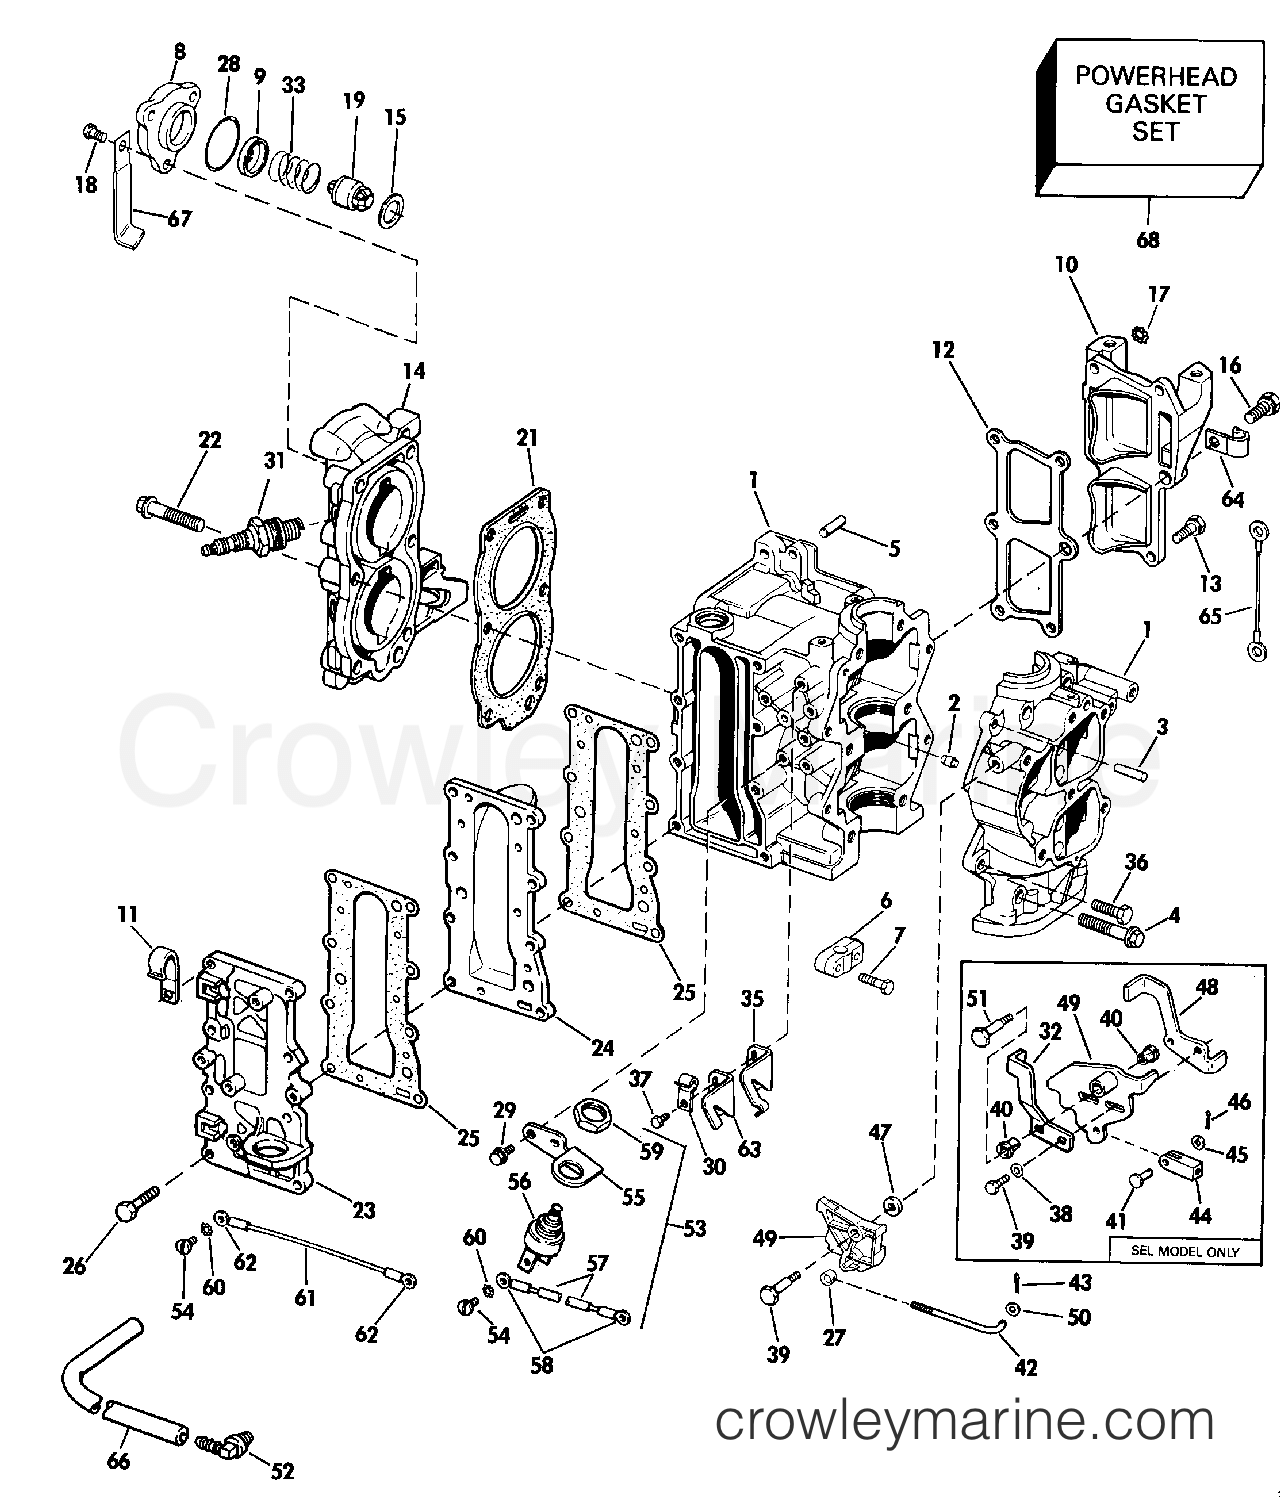 1990 Johnson Outboards 9.9 - TJ10ELESC CYLINDER & CRANKCASE section